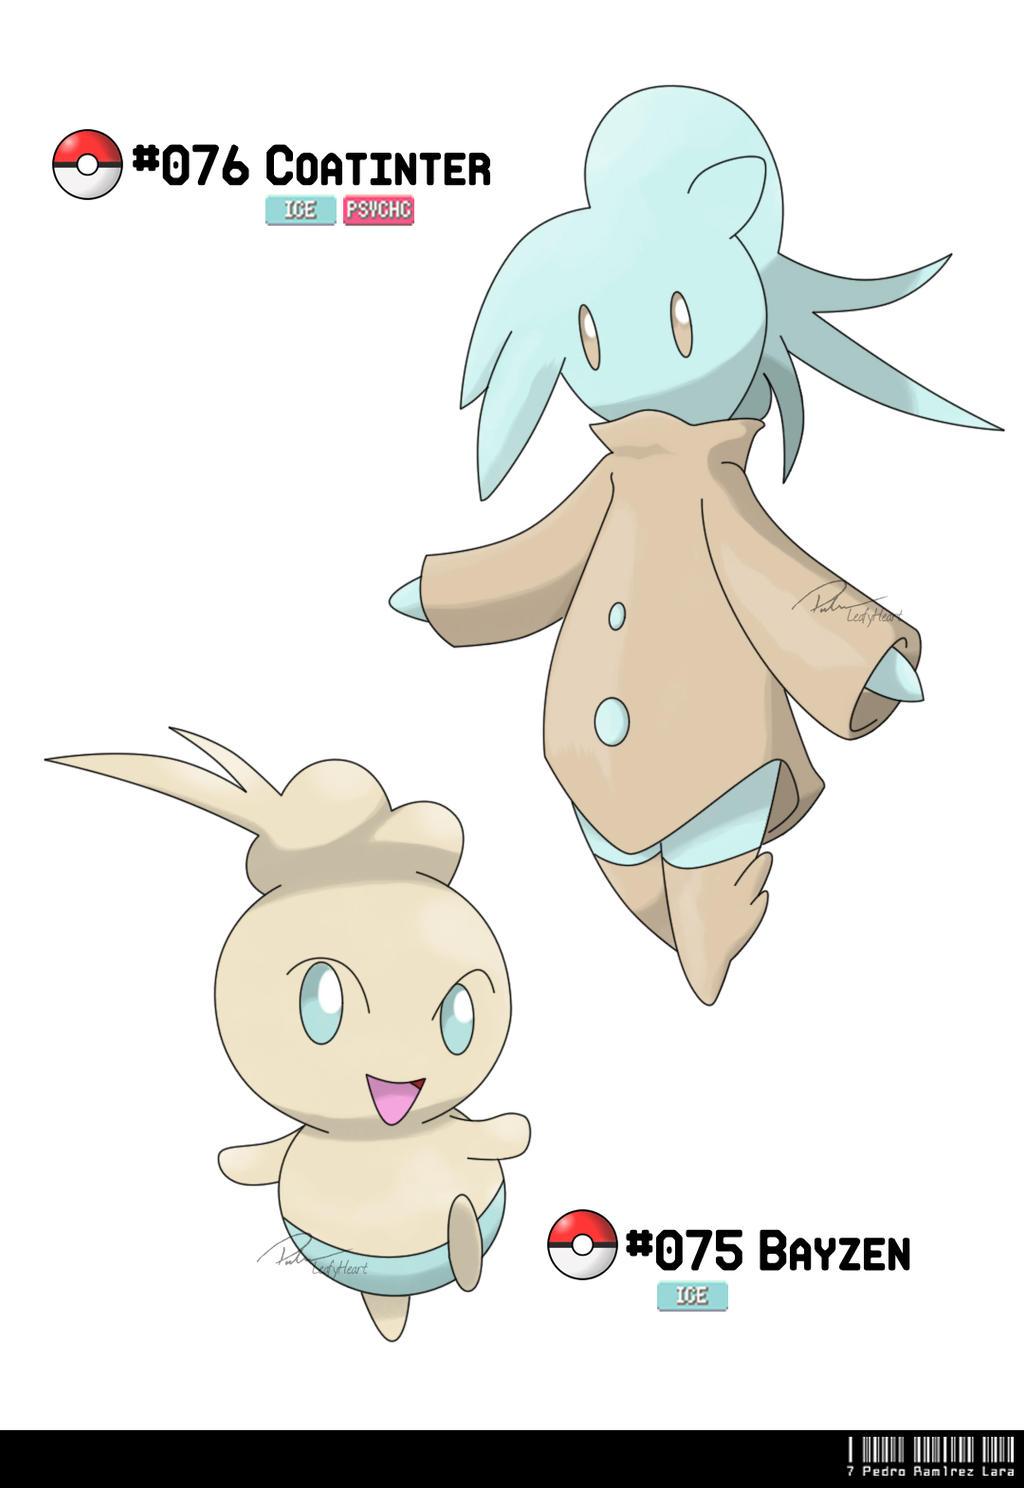 Ice Type Pokemon Wallpaper 075 - 076: Coat Fakemo...